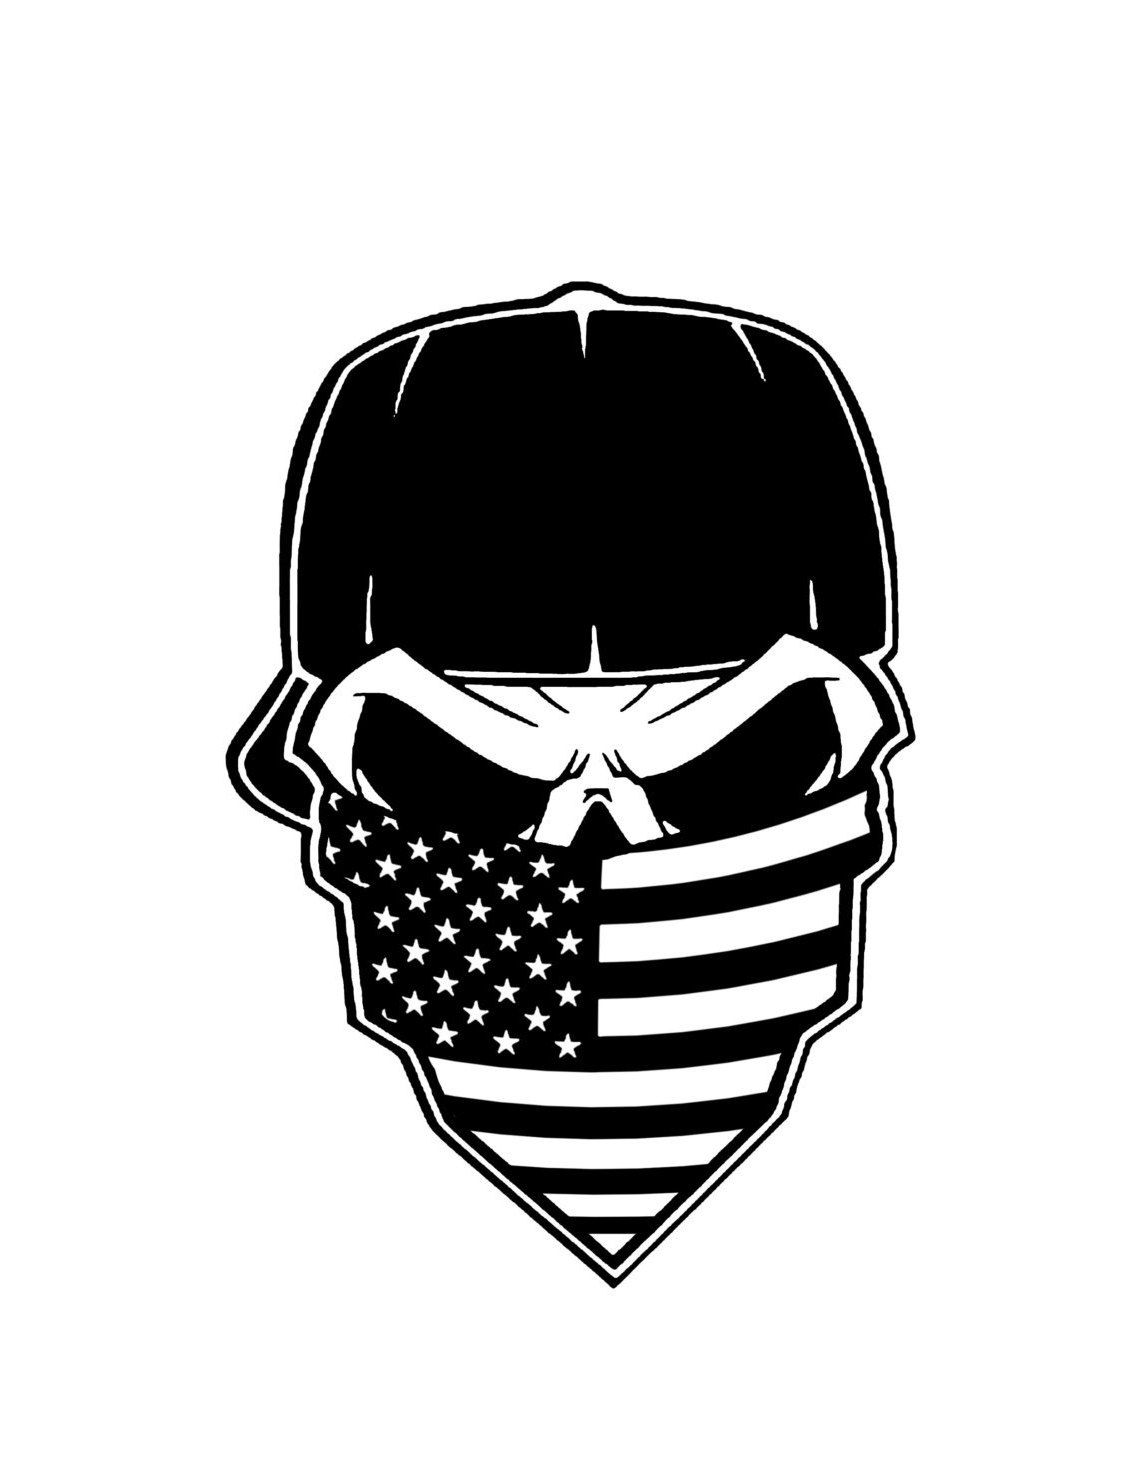 Bandana clipart skull, Bandana skull Transparent FREE for.